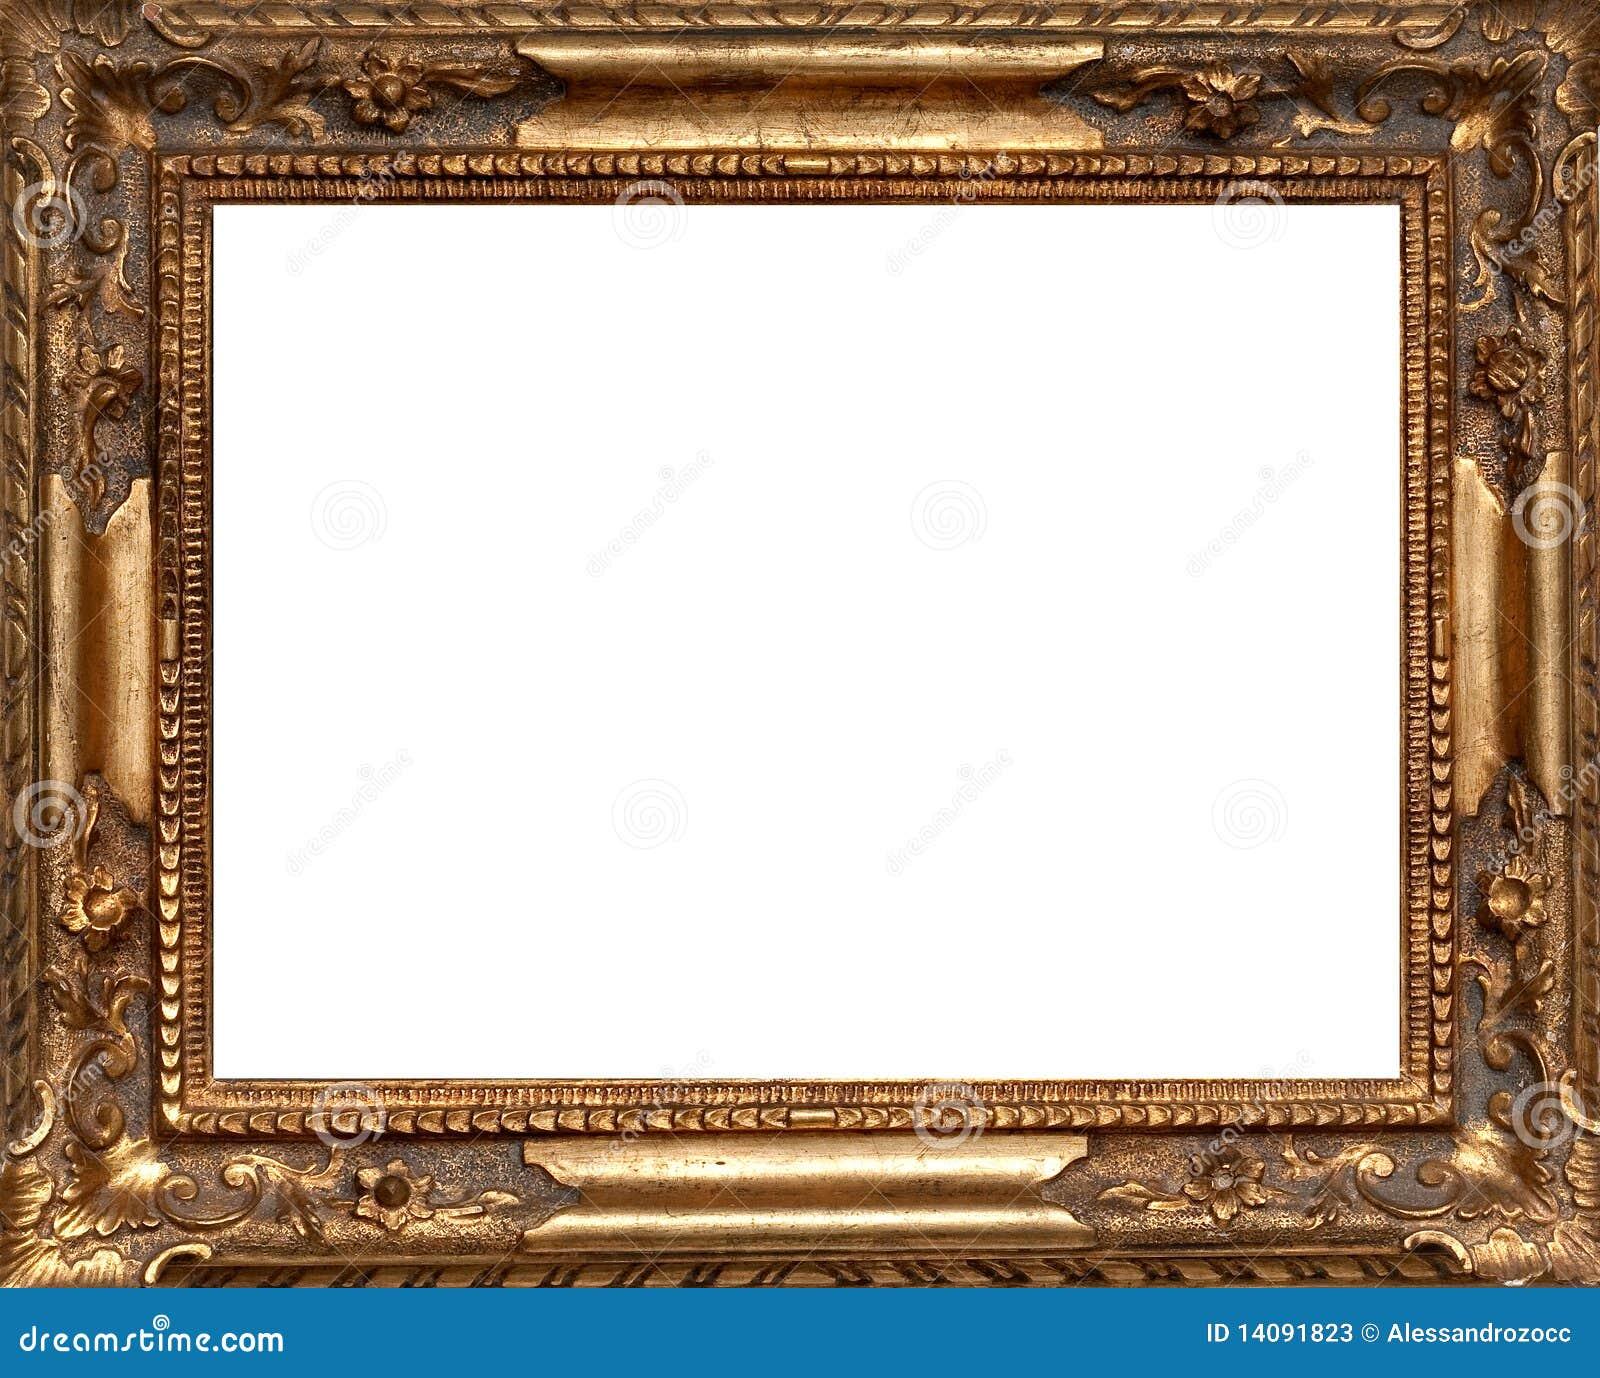 Painting frame stock image. Image of antique, background - 2775209